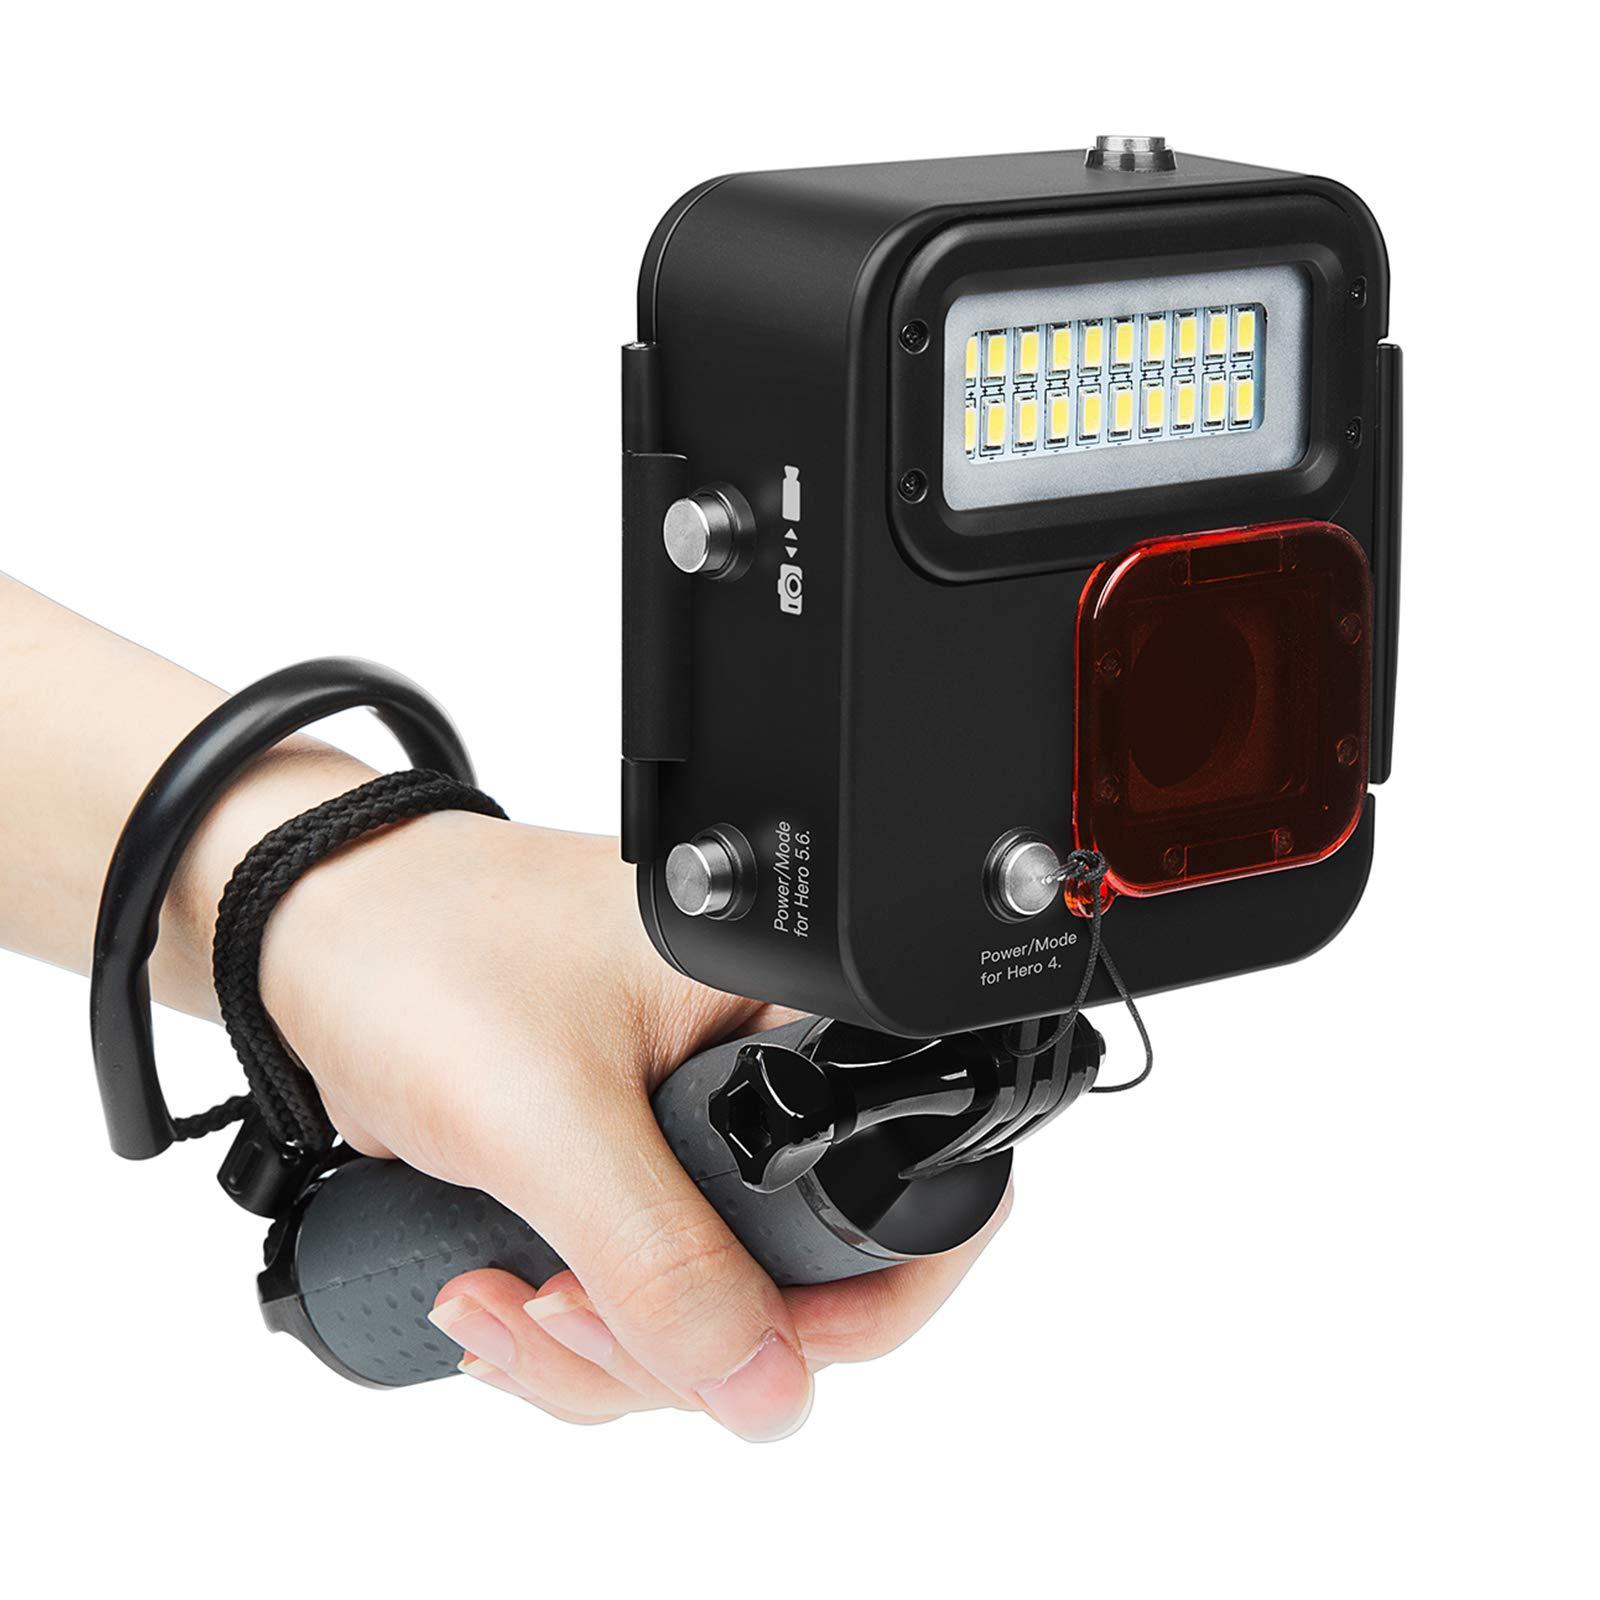 SHOOT 1000LM Kangaroo Diving Light for GoPro HERO7 Black/HERO6/HERO5/HERO4/HERO(2018),Waterproof Case 30m (98 feet), LED Underwater Scuba Fill Light,Removeble Red Filter by SHOOT (Image #1)